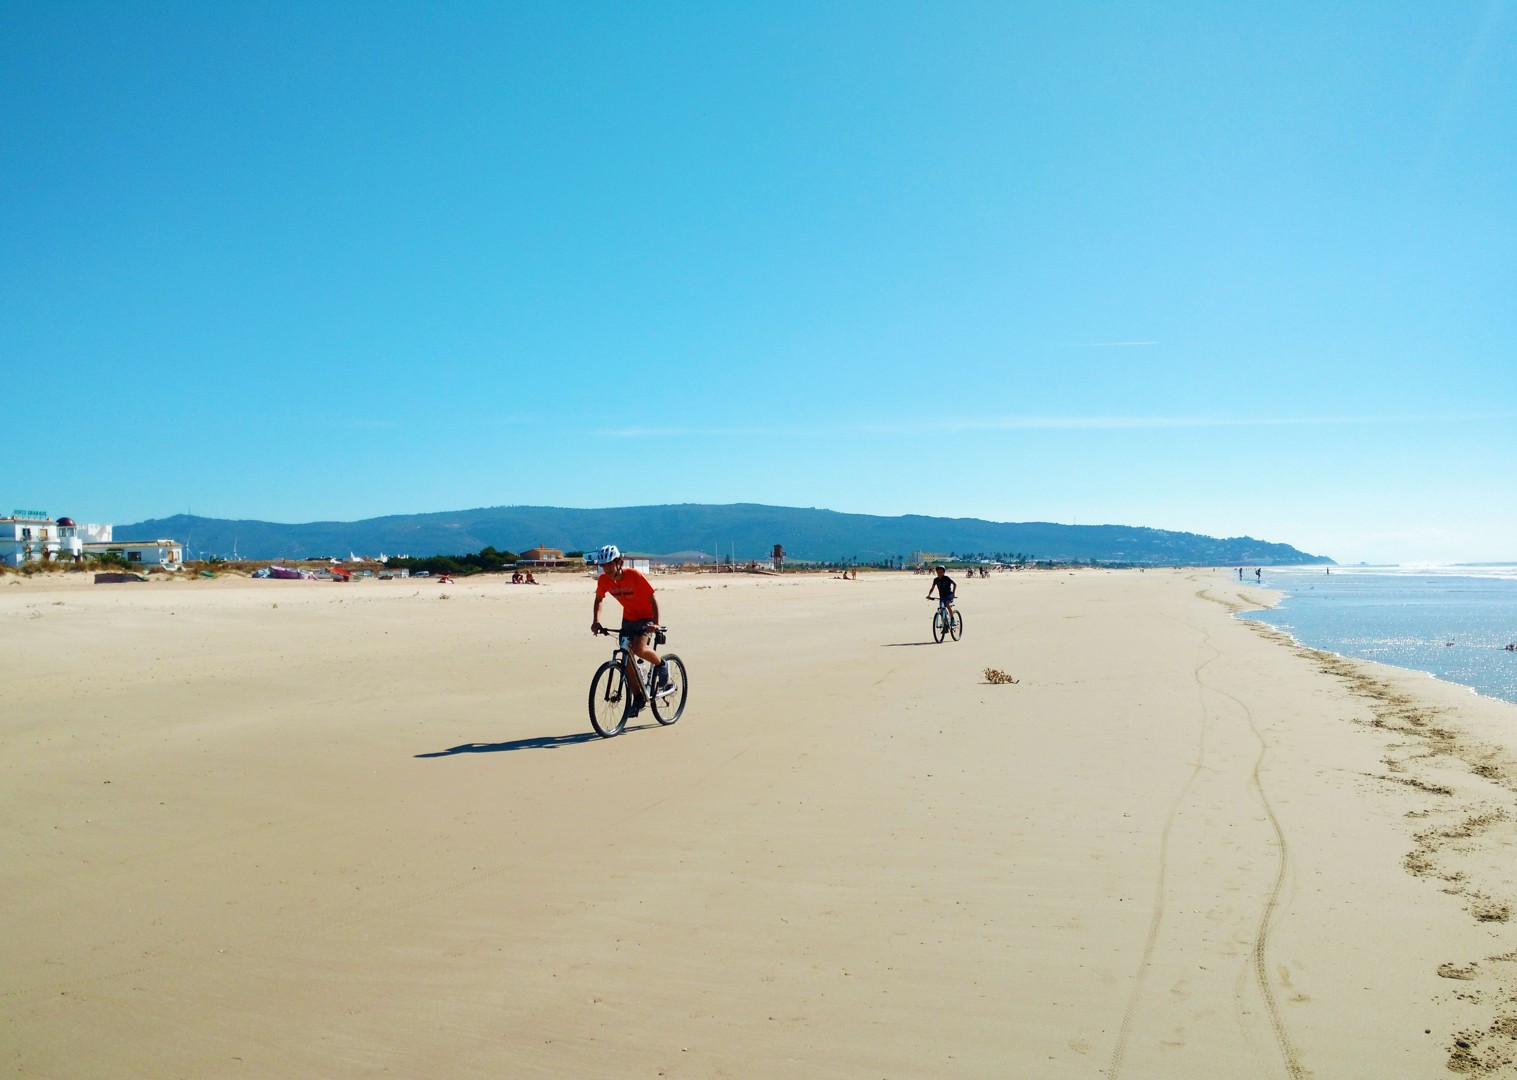 IMG_20171025_134258991.jpg - Southern Spain - Coastal Adventurer - Family Cycling